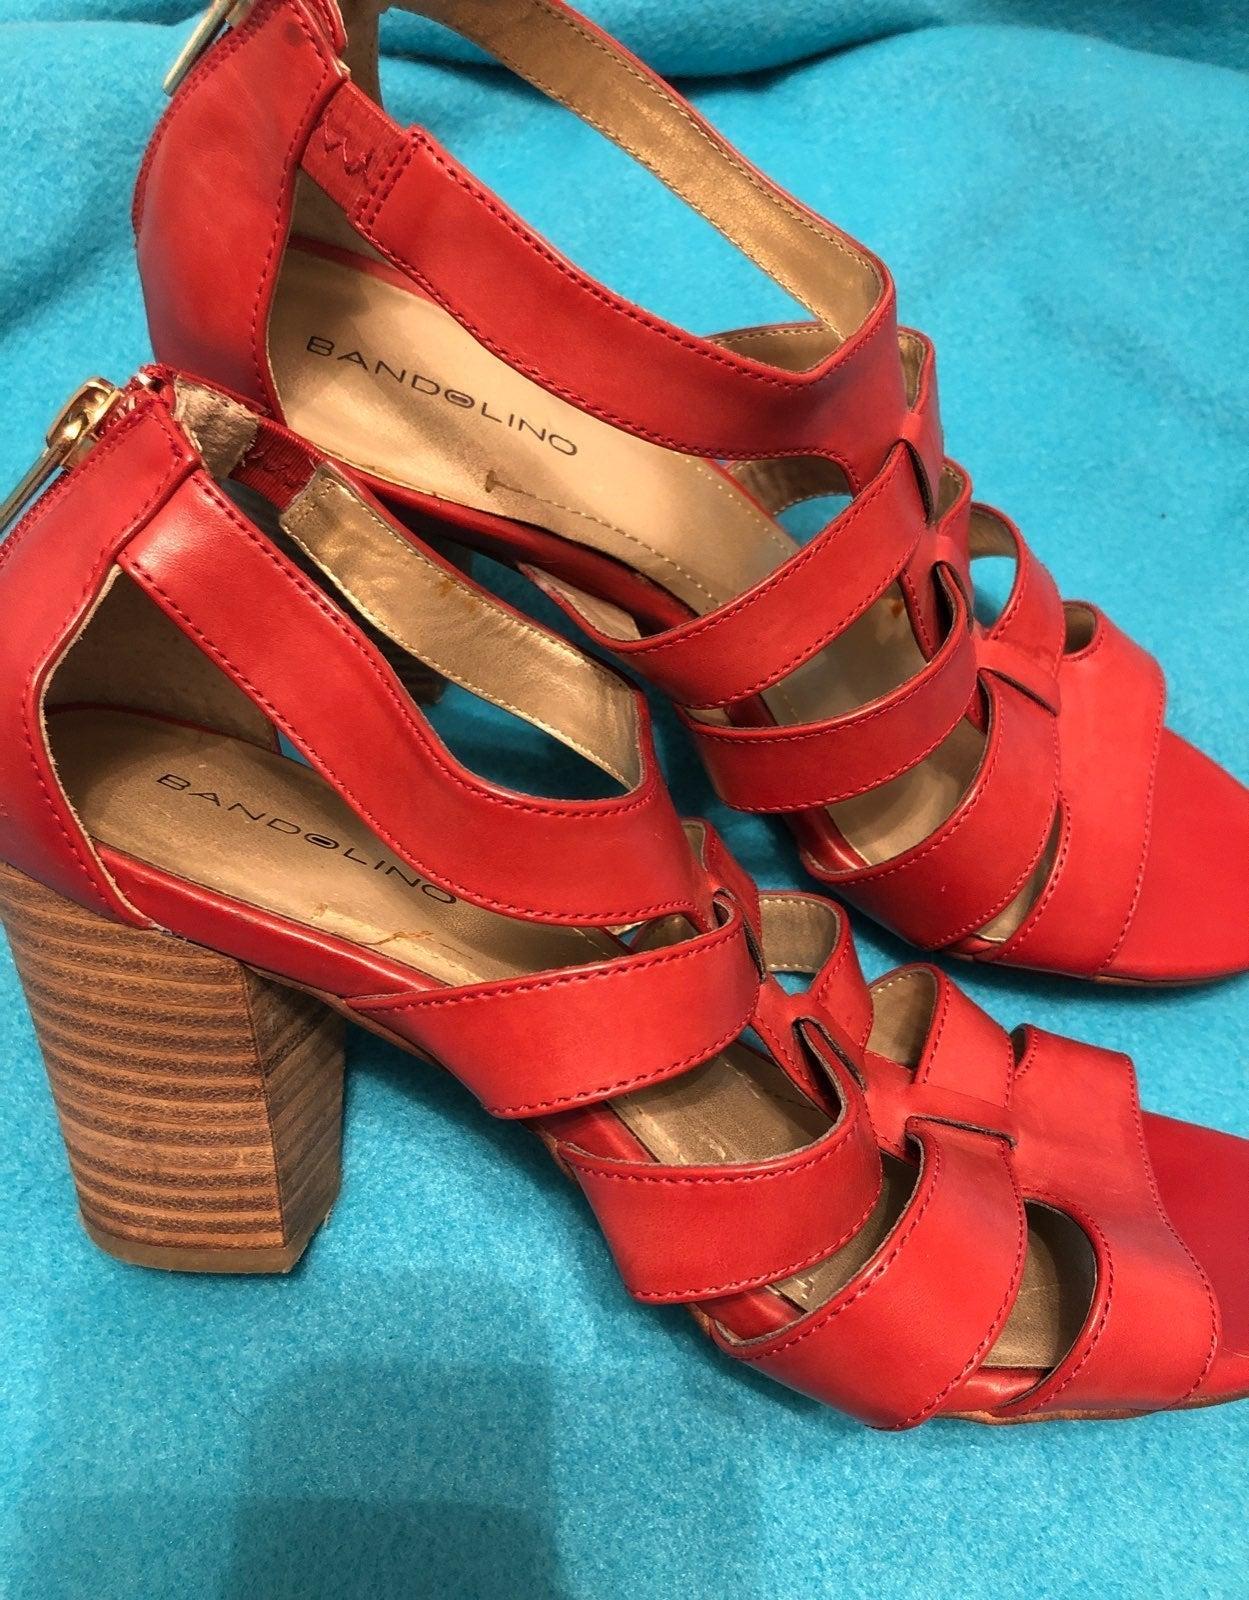 Red Bandolino Sandals Heels Size 8